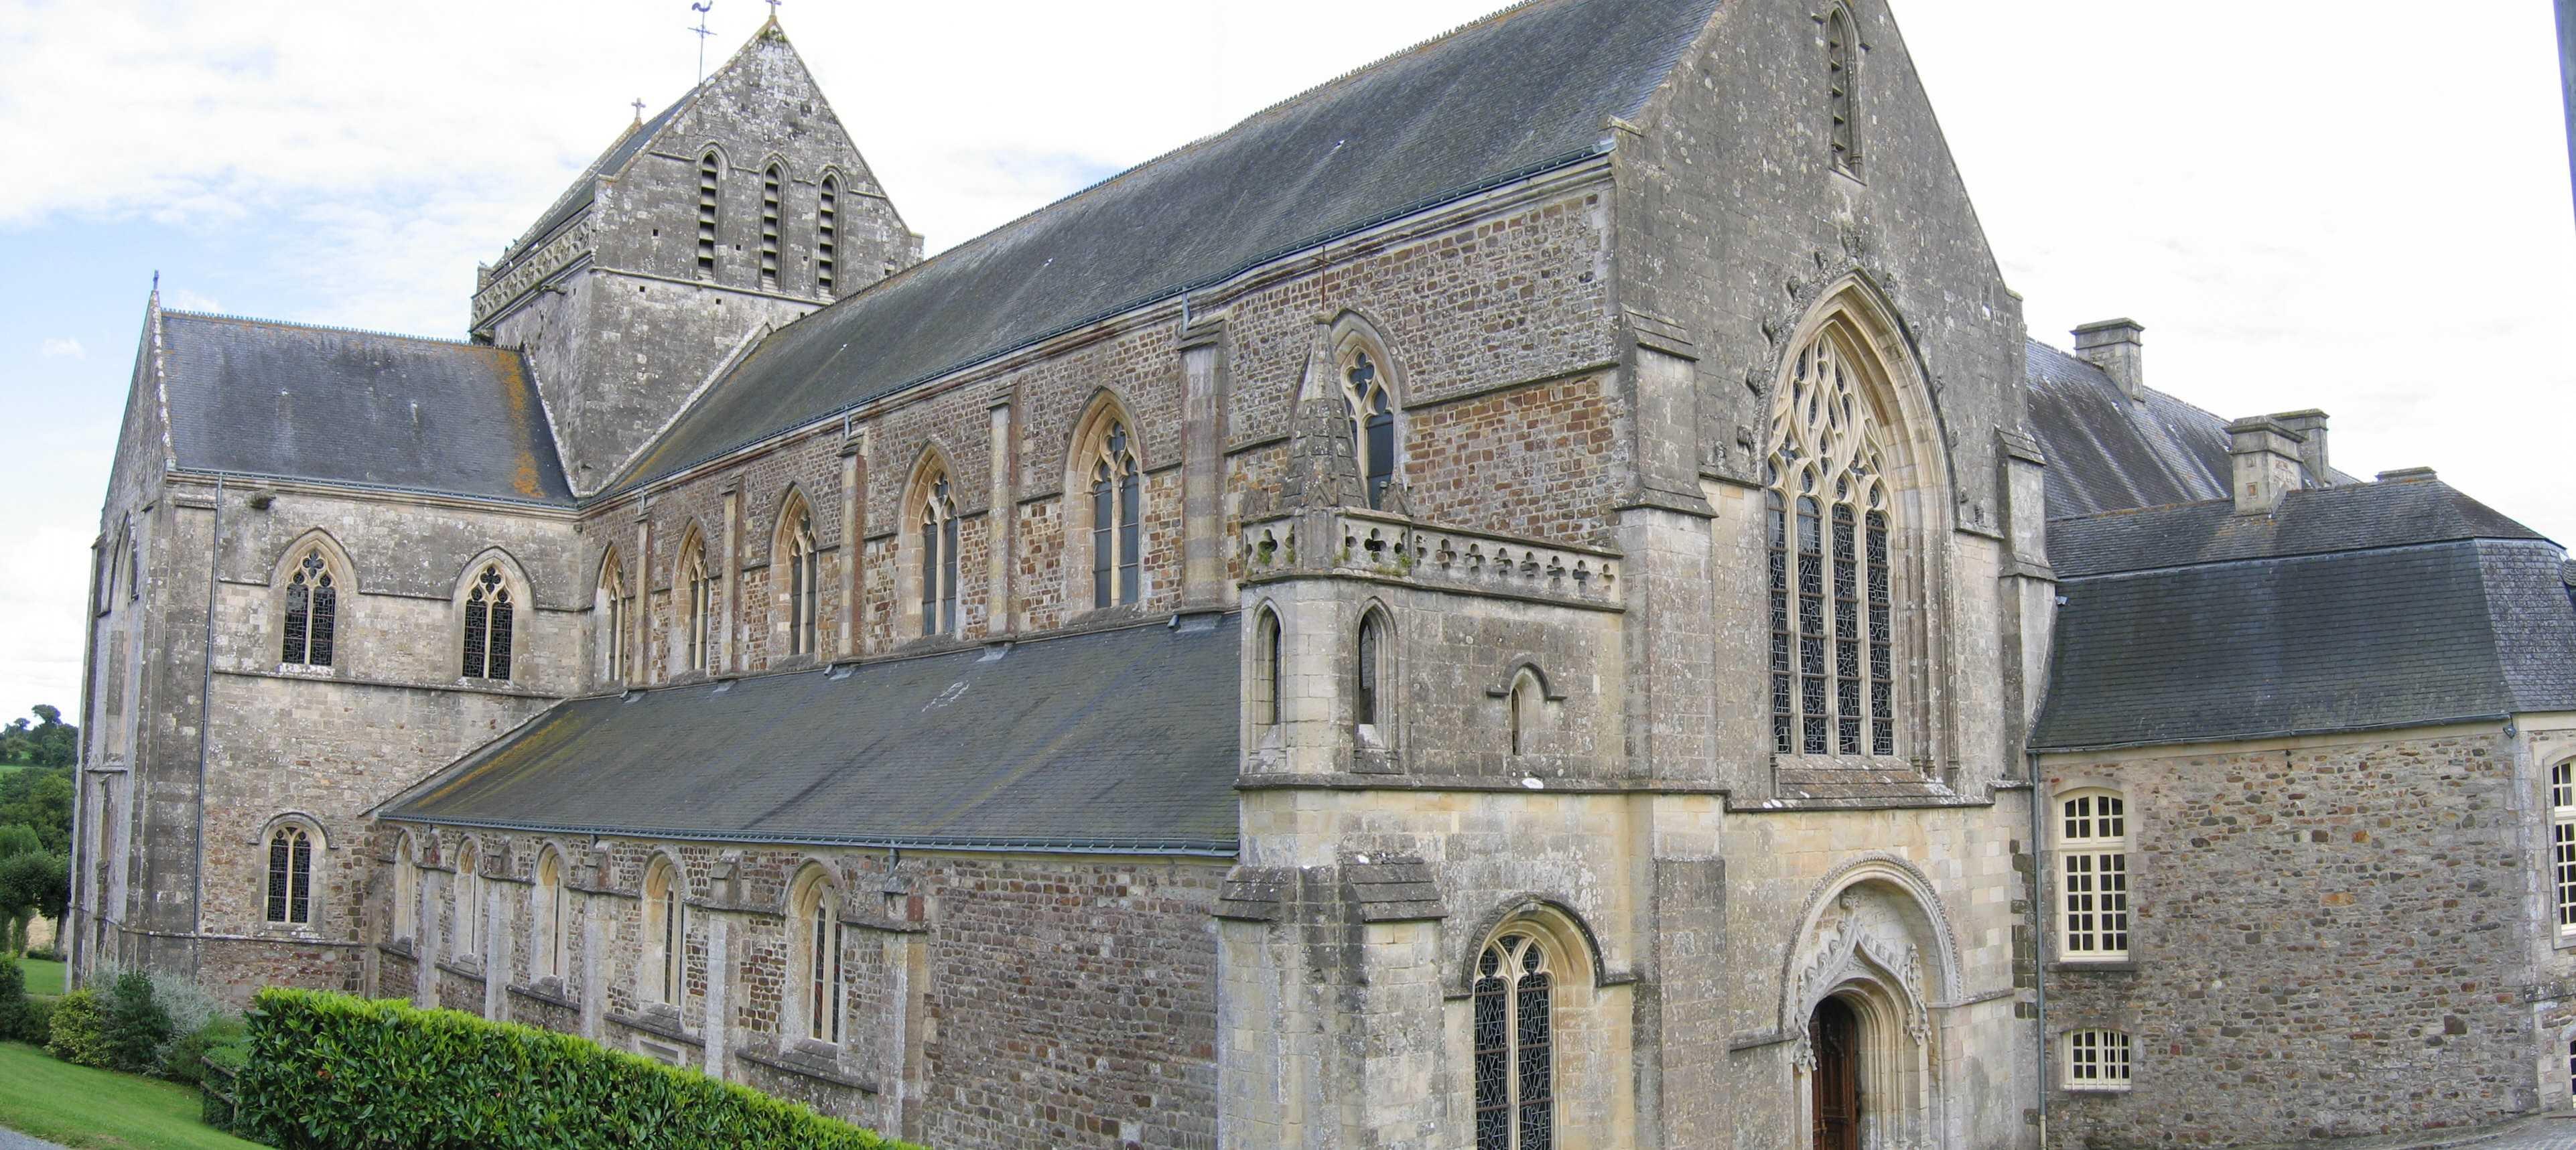 Abbey of saint sauveur le vicomte wikiwand - Piscine saint sauveur le vicomte ...